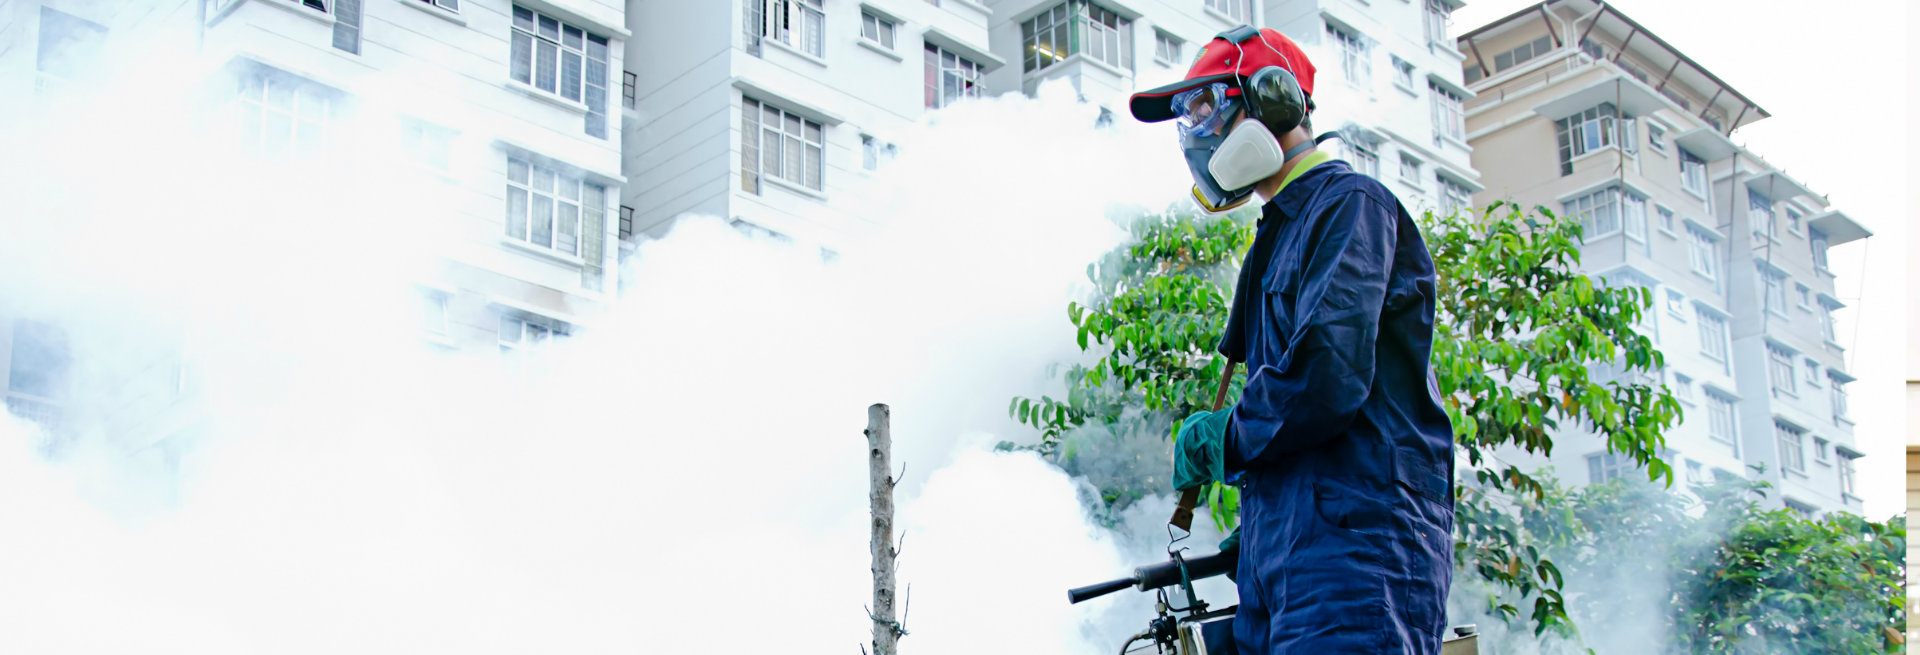 Termipest Limited - Pest Control Services